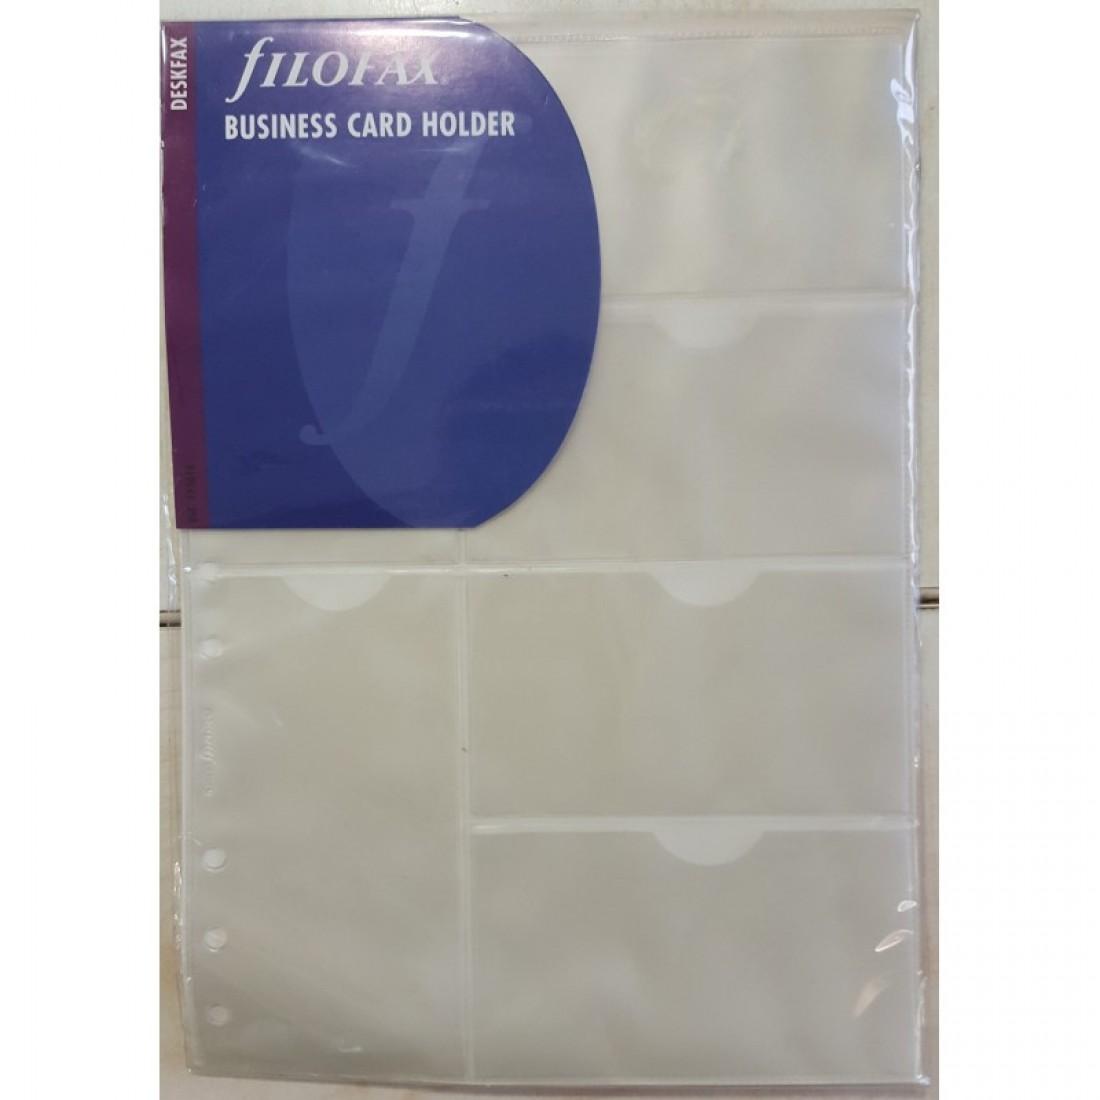 Filofax Business Card Holder